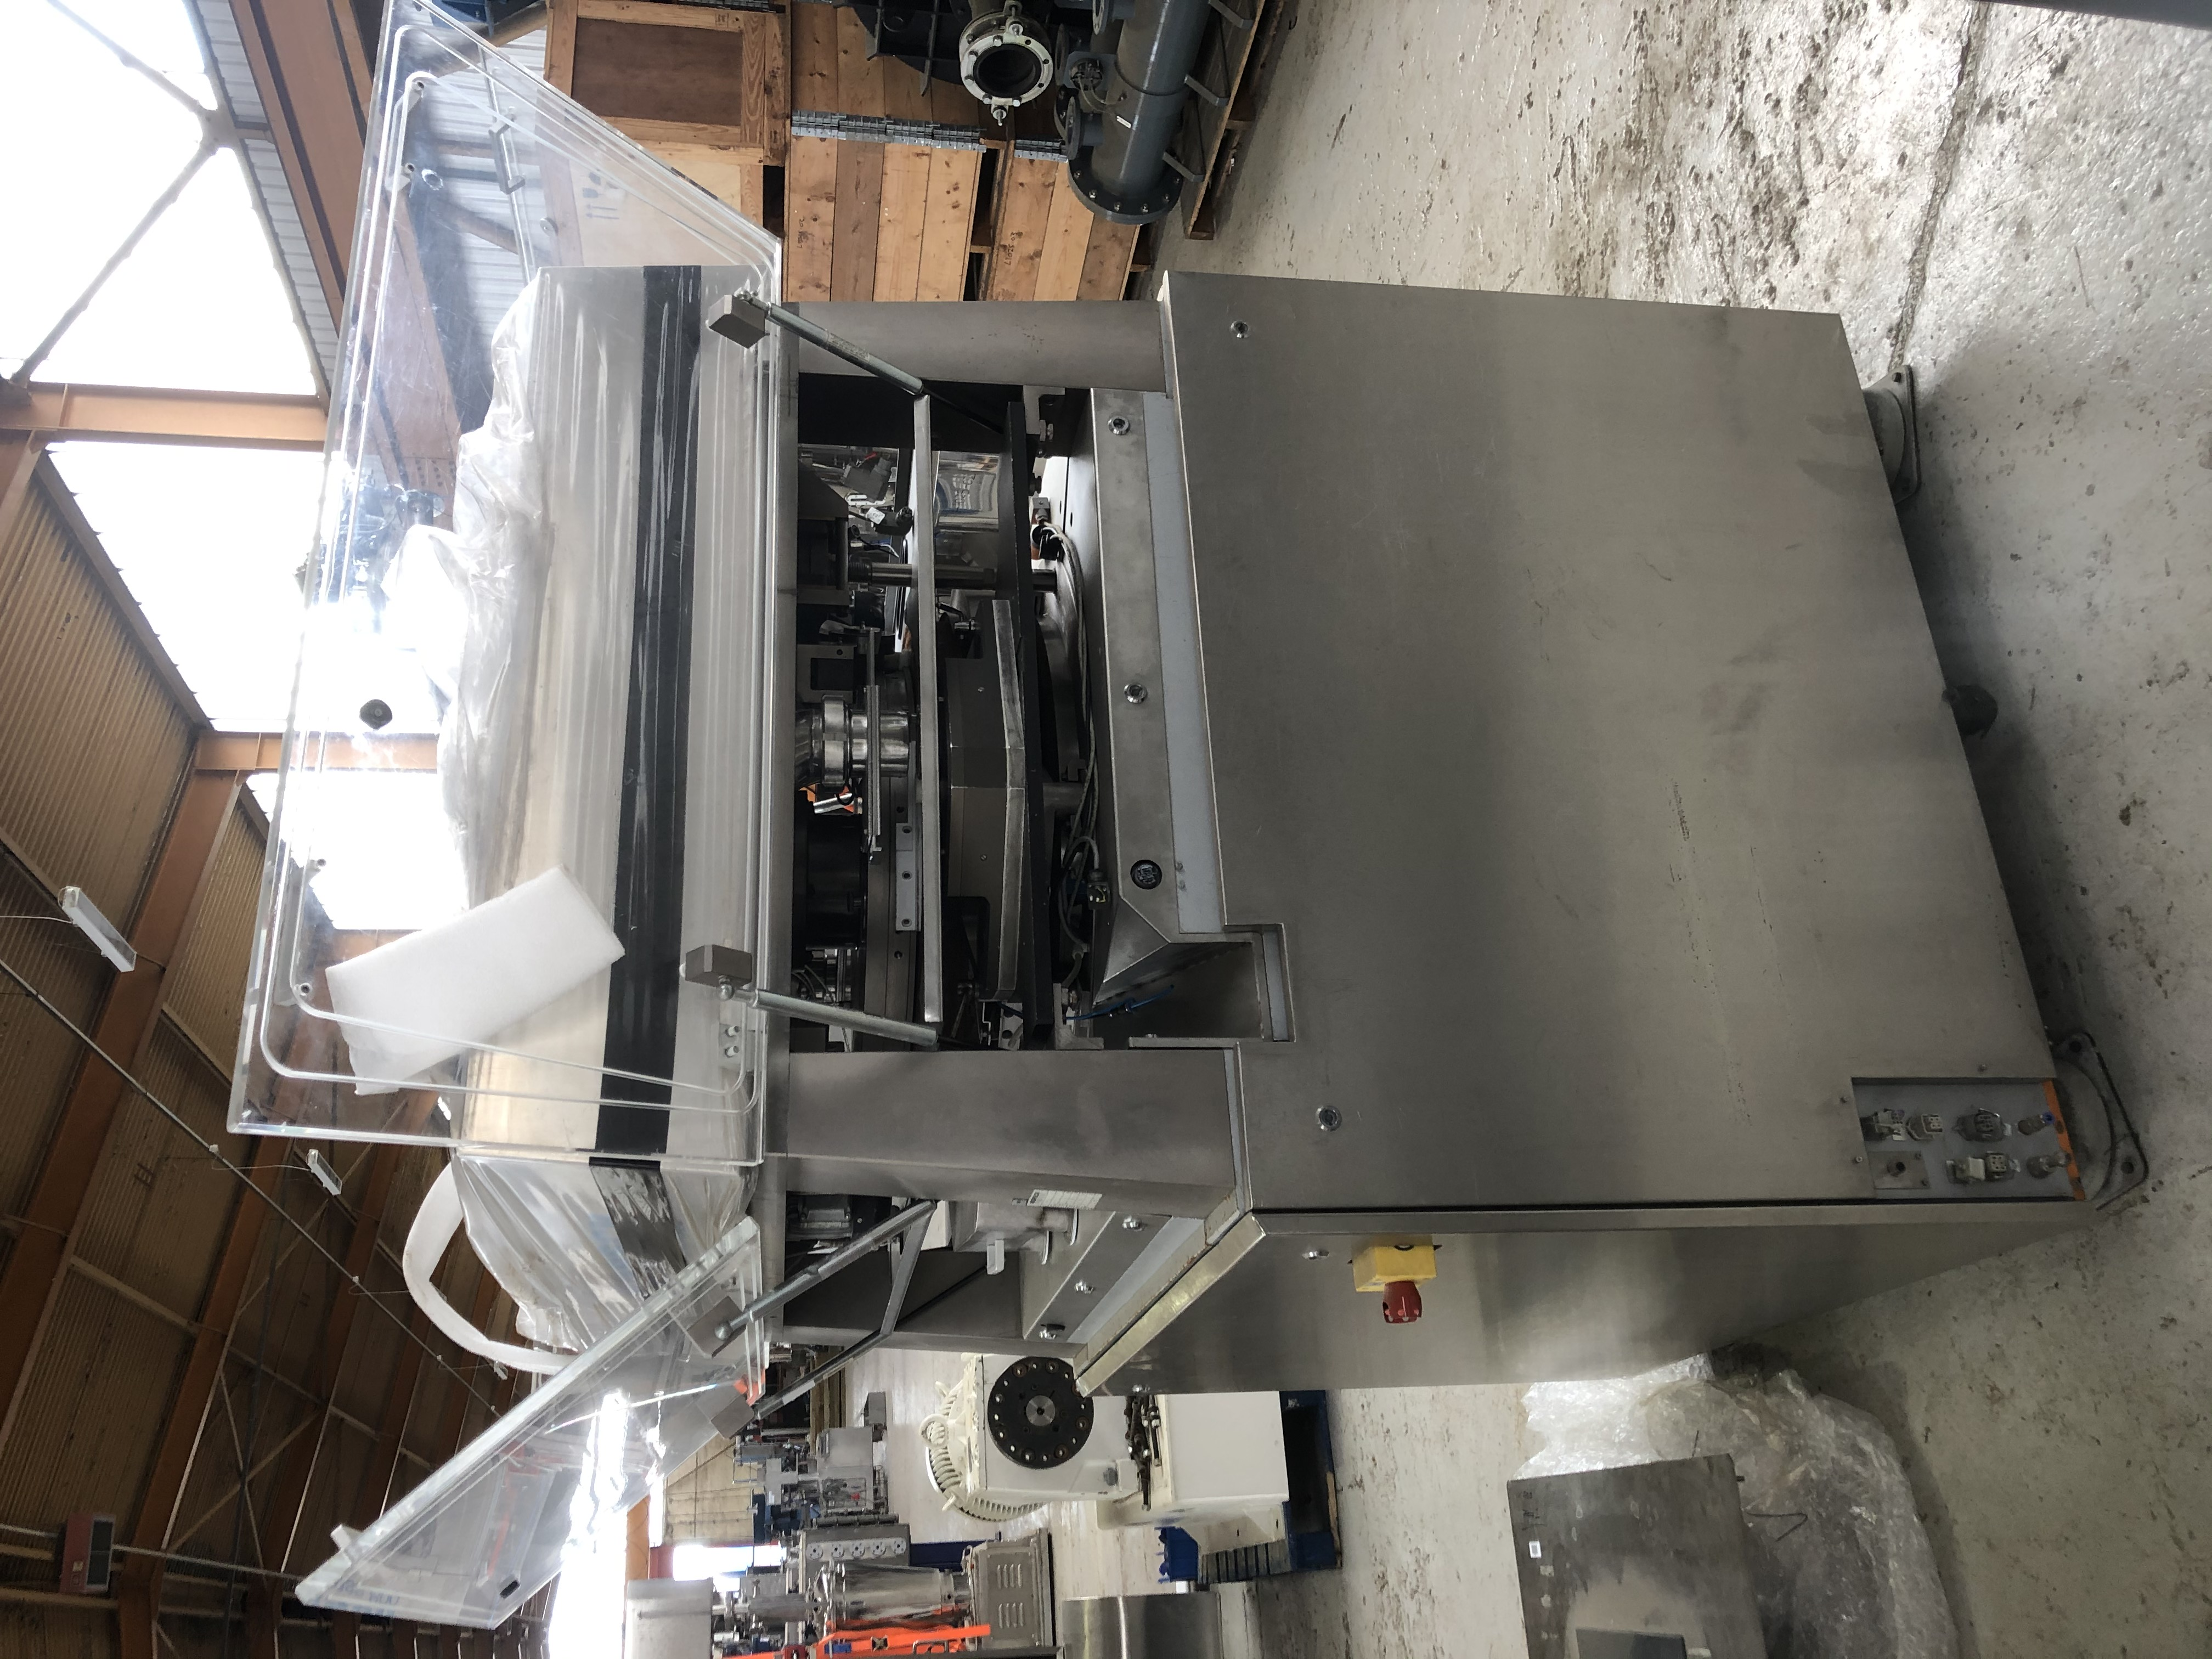 8.0 Tons 77 Station Rotary Tablet Press Korsch Model P800/77